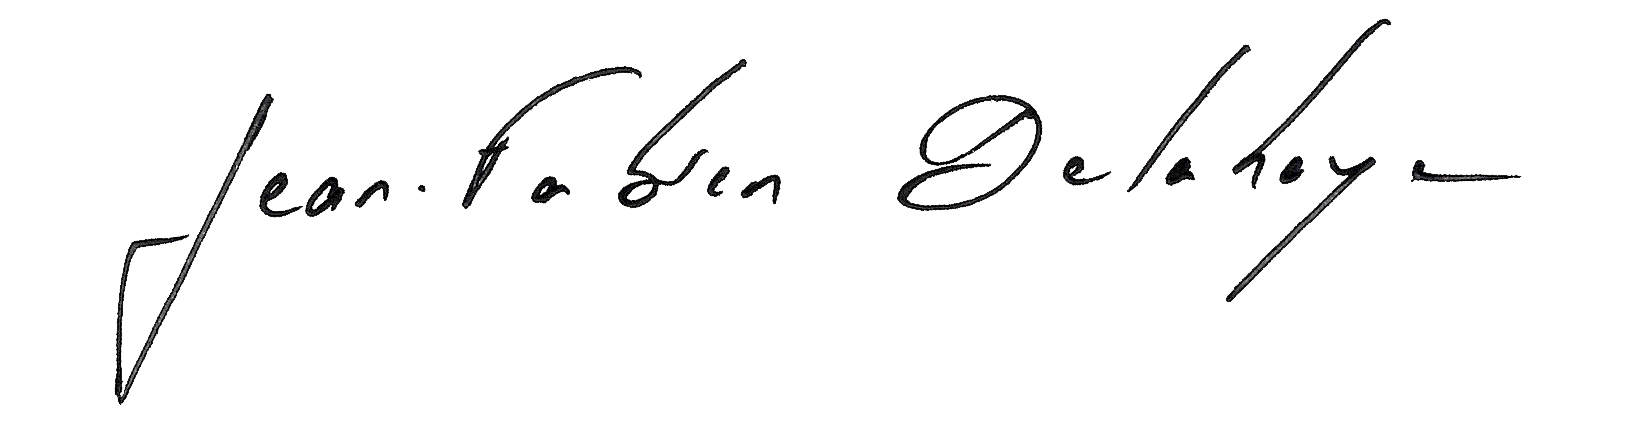 http://osteopathe-manche.com/wp-content/uploads/2015/11/signature.png